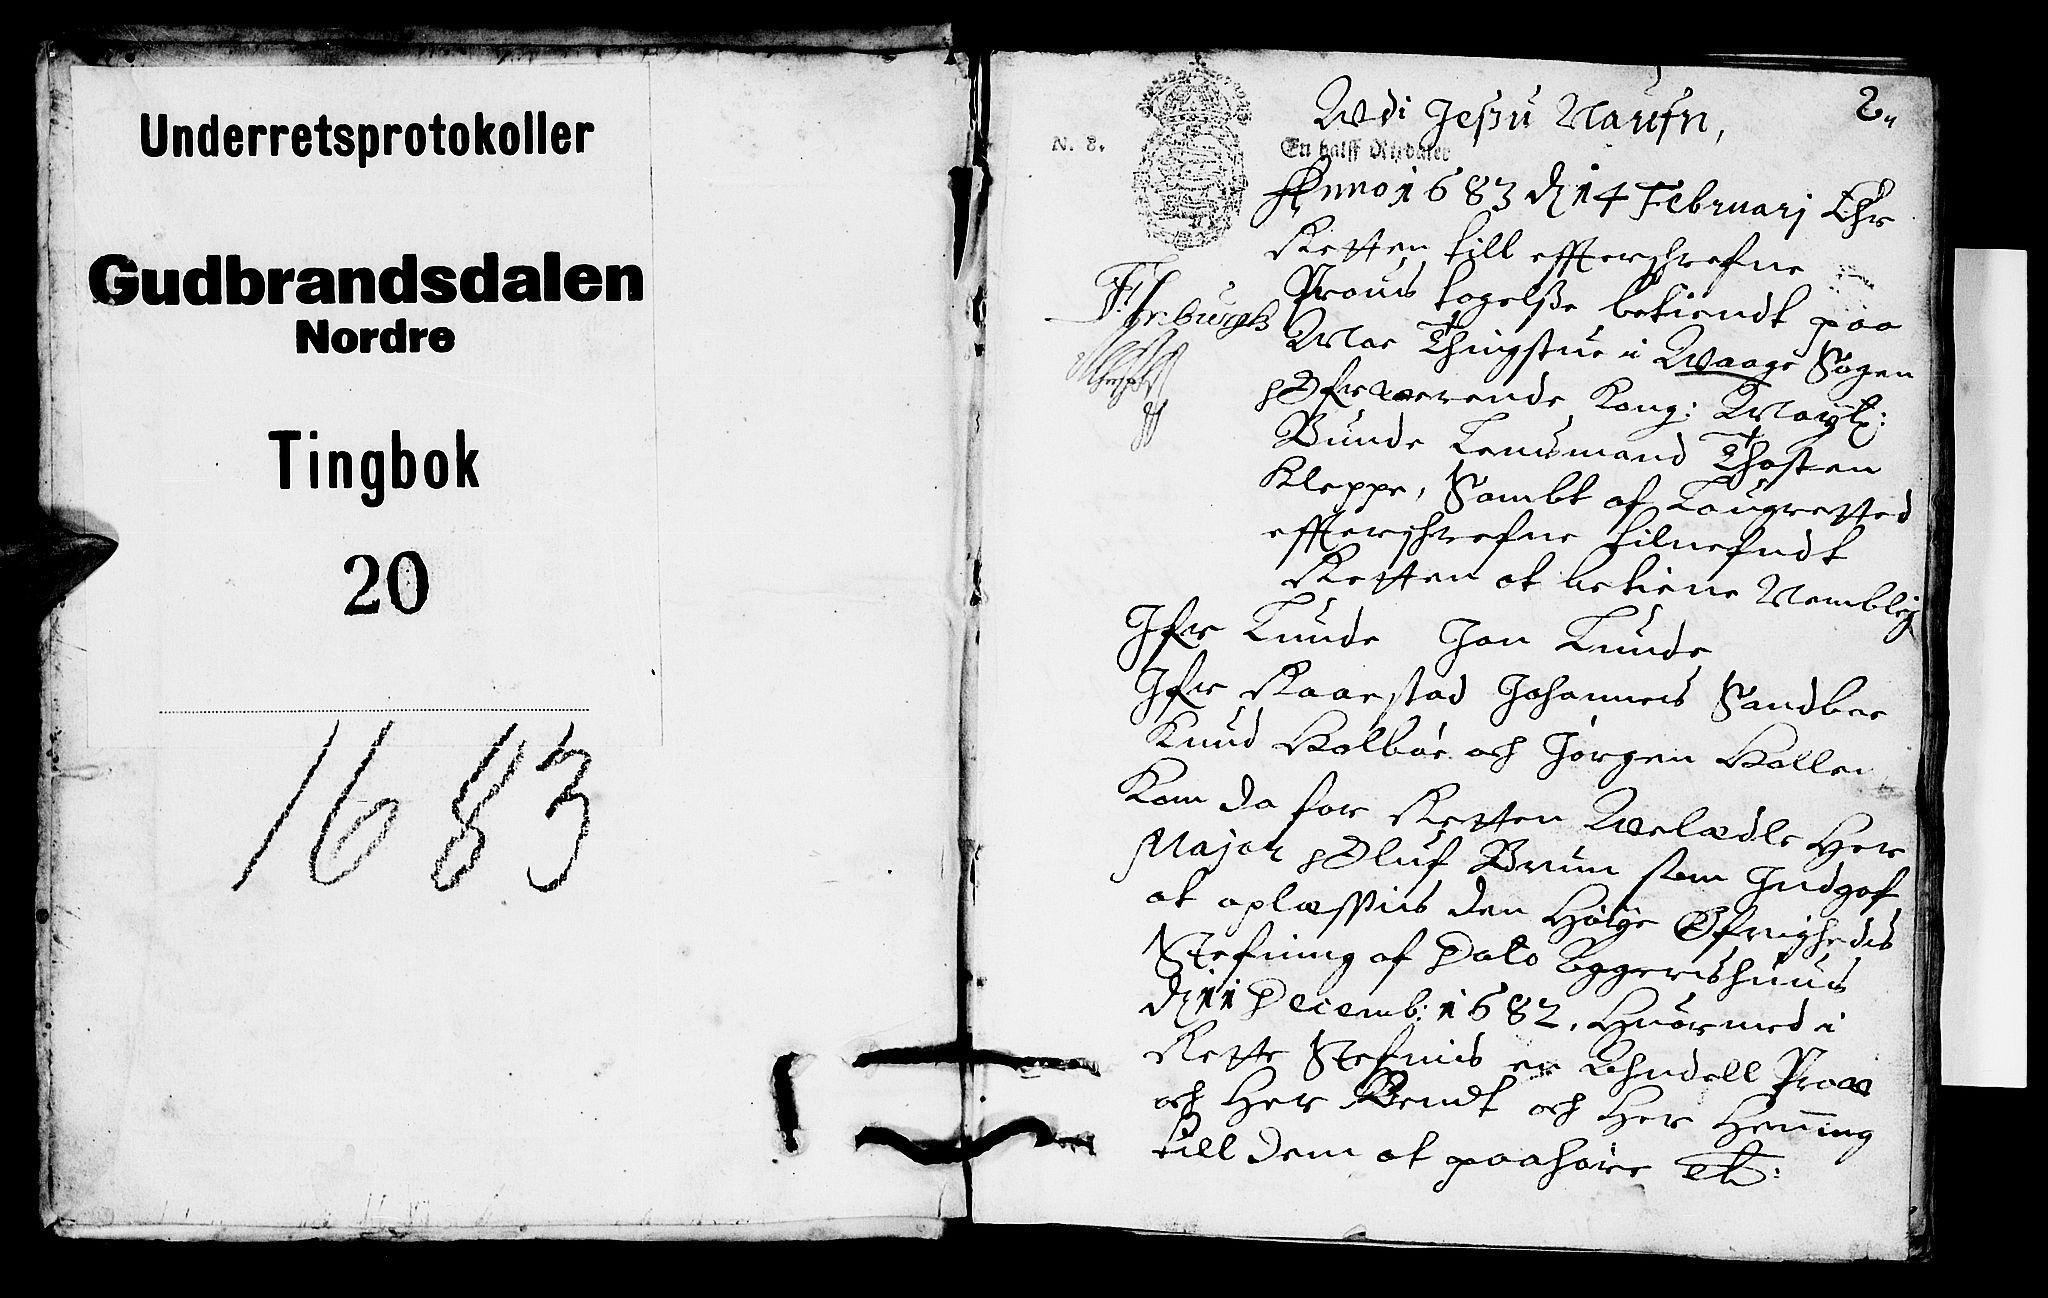 SAH, Sorenskriverier i Gudbrandsdalen, G/Gb/Gba/L0019: Tingbok - Nord-Gudbrandsdal, 1683, p. 1b-2a